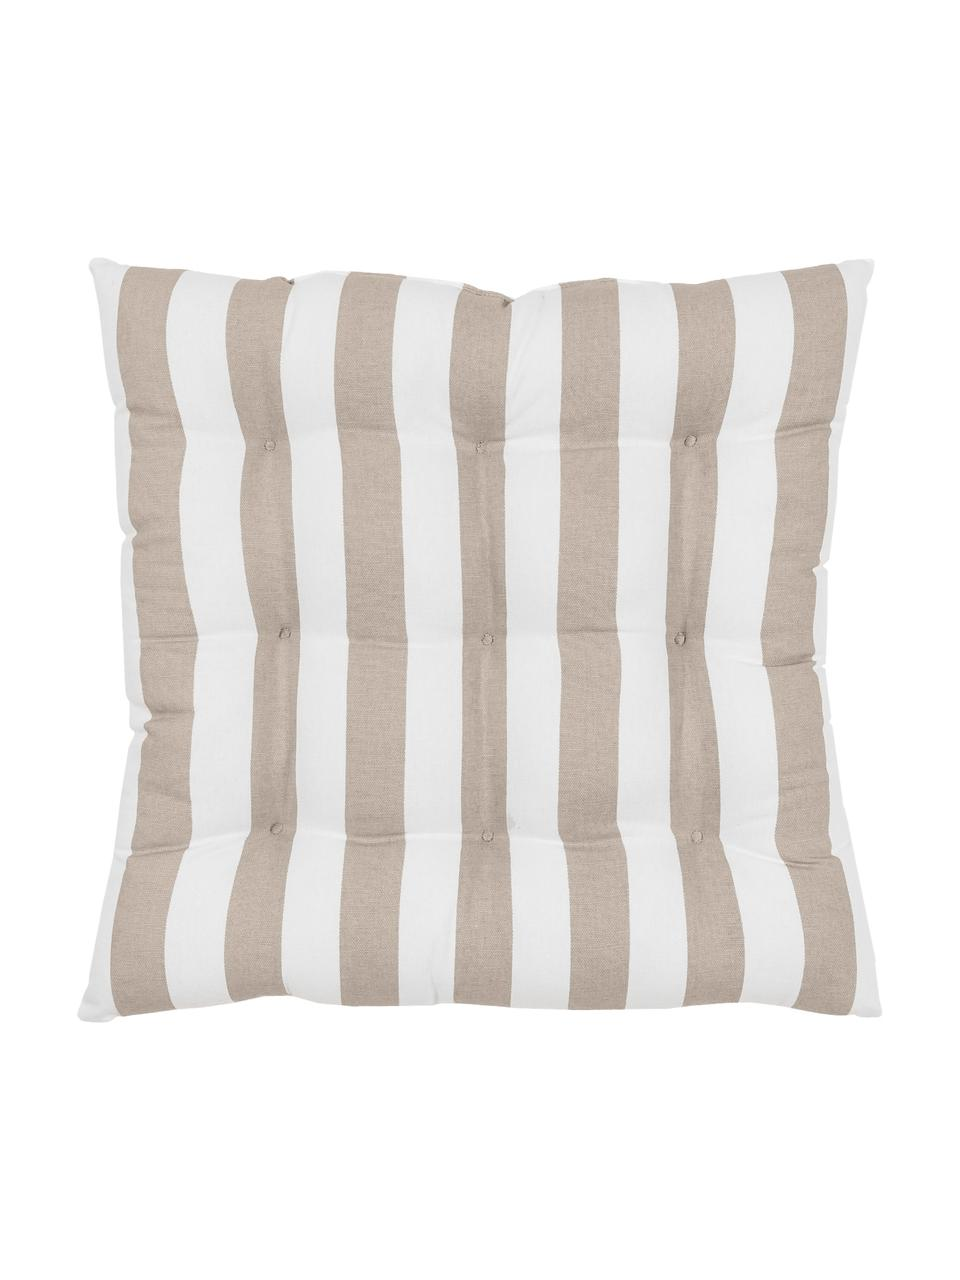 Cuscino sedia a righe taupe/bianco Timon, Rivestimento: 100% cotone, Taupe, bianco, Larg. 40 x Lung. 40 cm